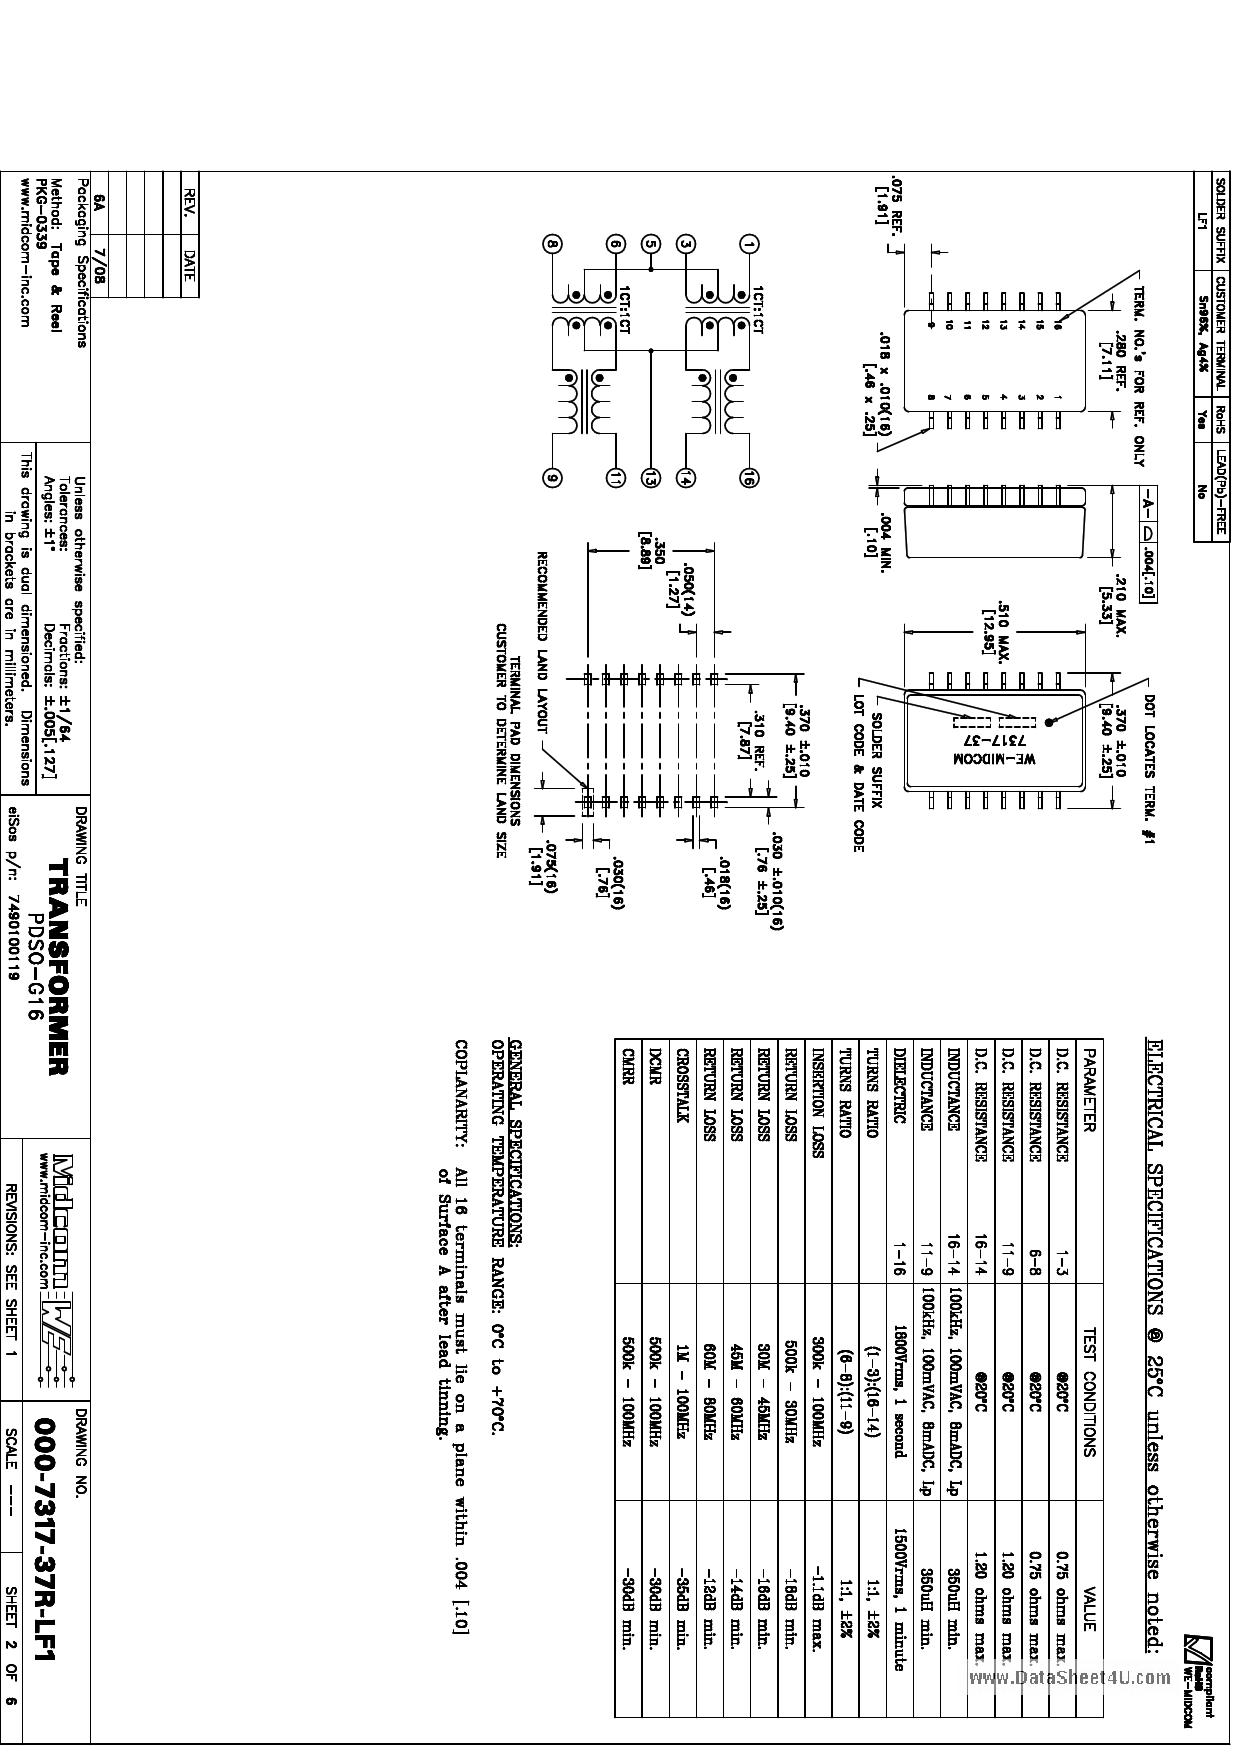 000-7317-37R-LF1 даташит PDF